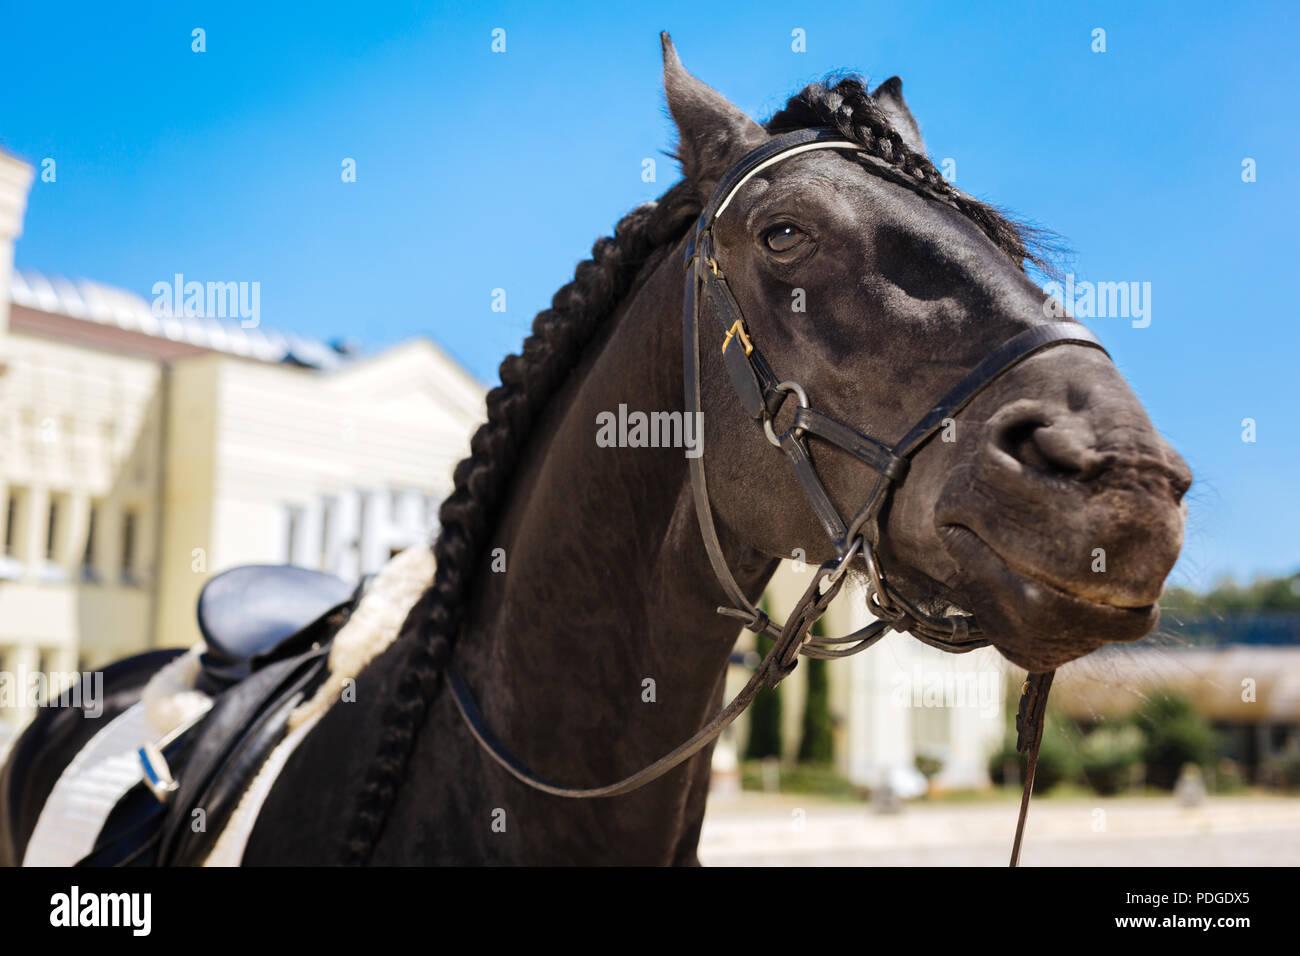 Black dark-eyed horse submissively standing on big race track - Stock Image